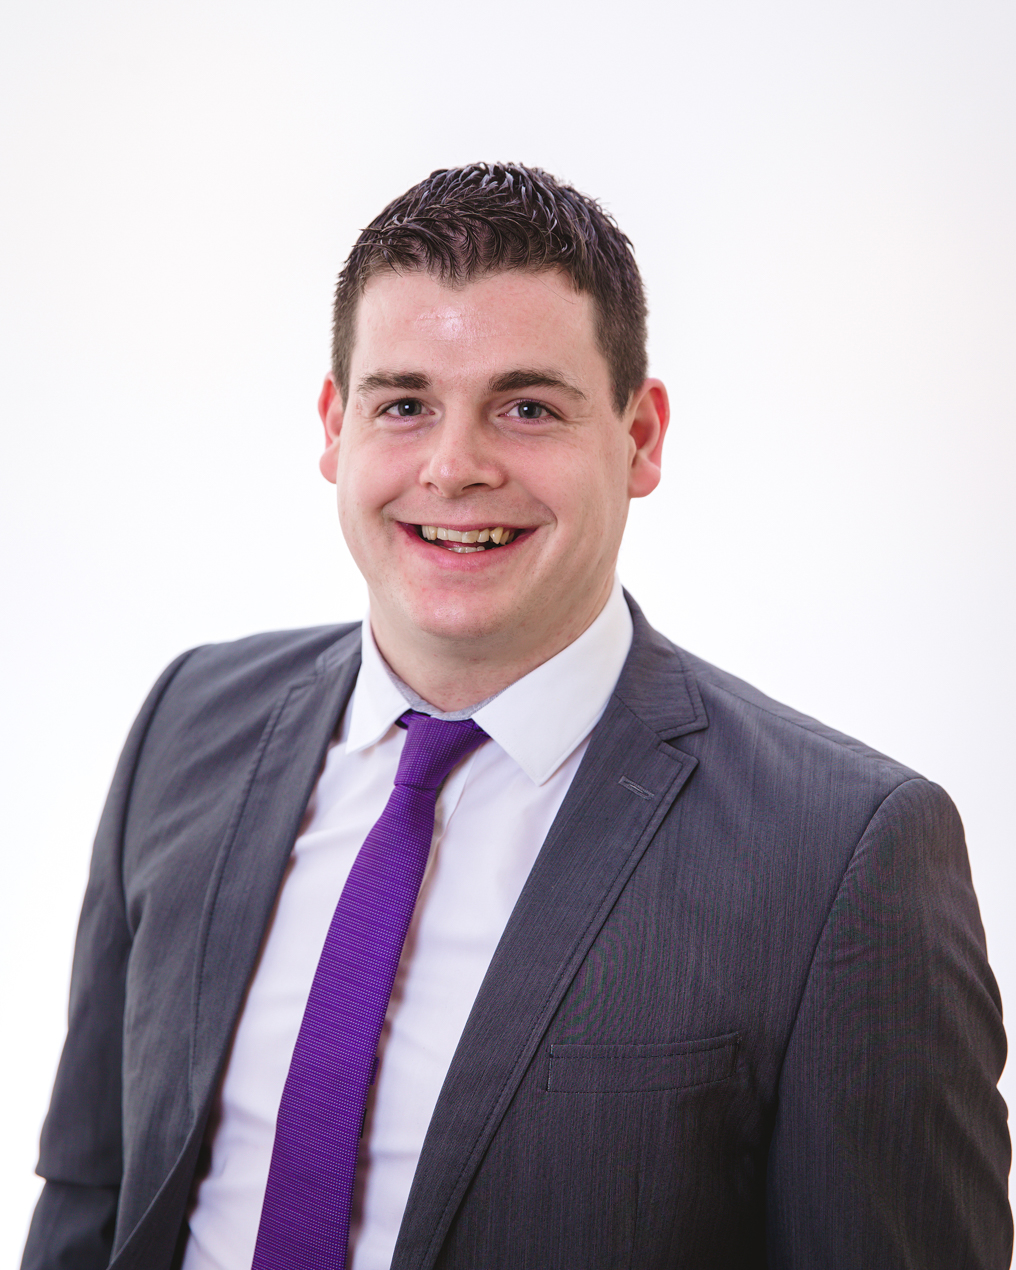 Laurence O'Flynn Senior Software Consultant